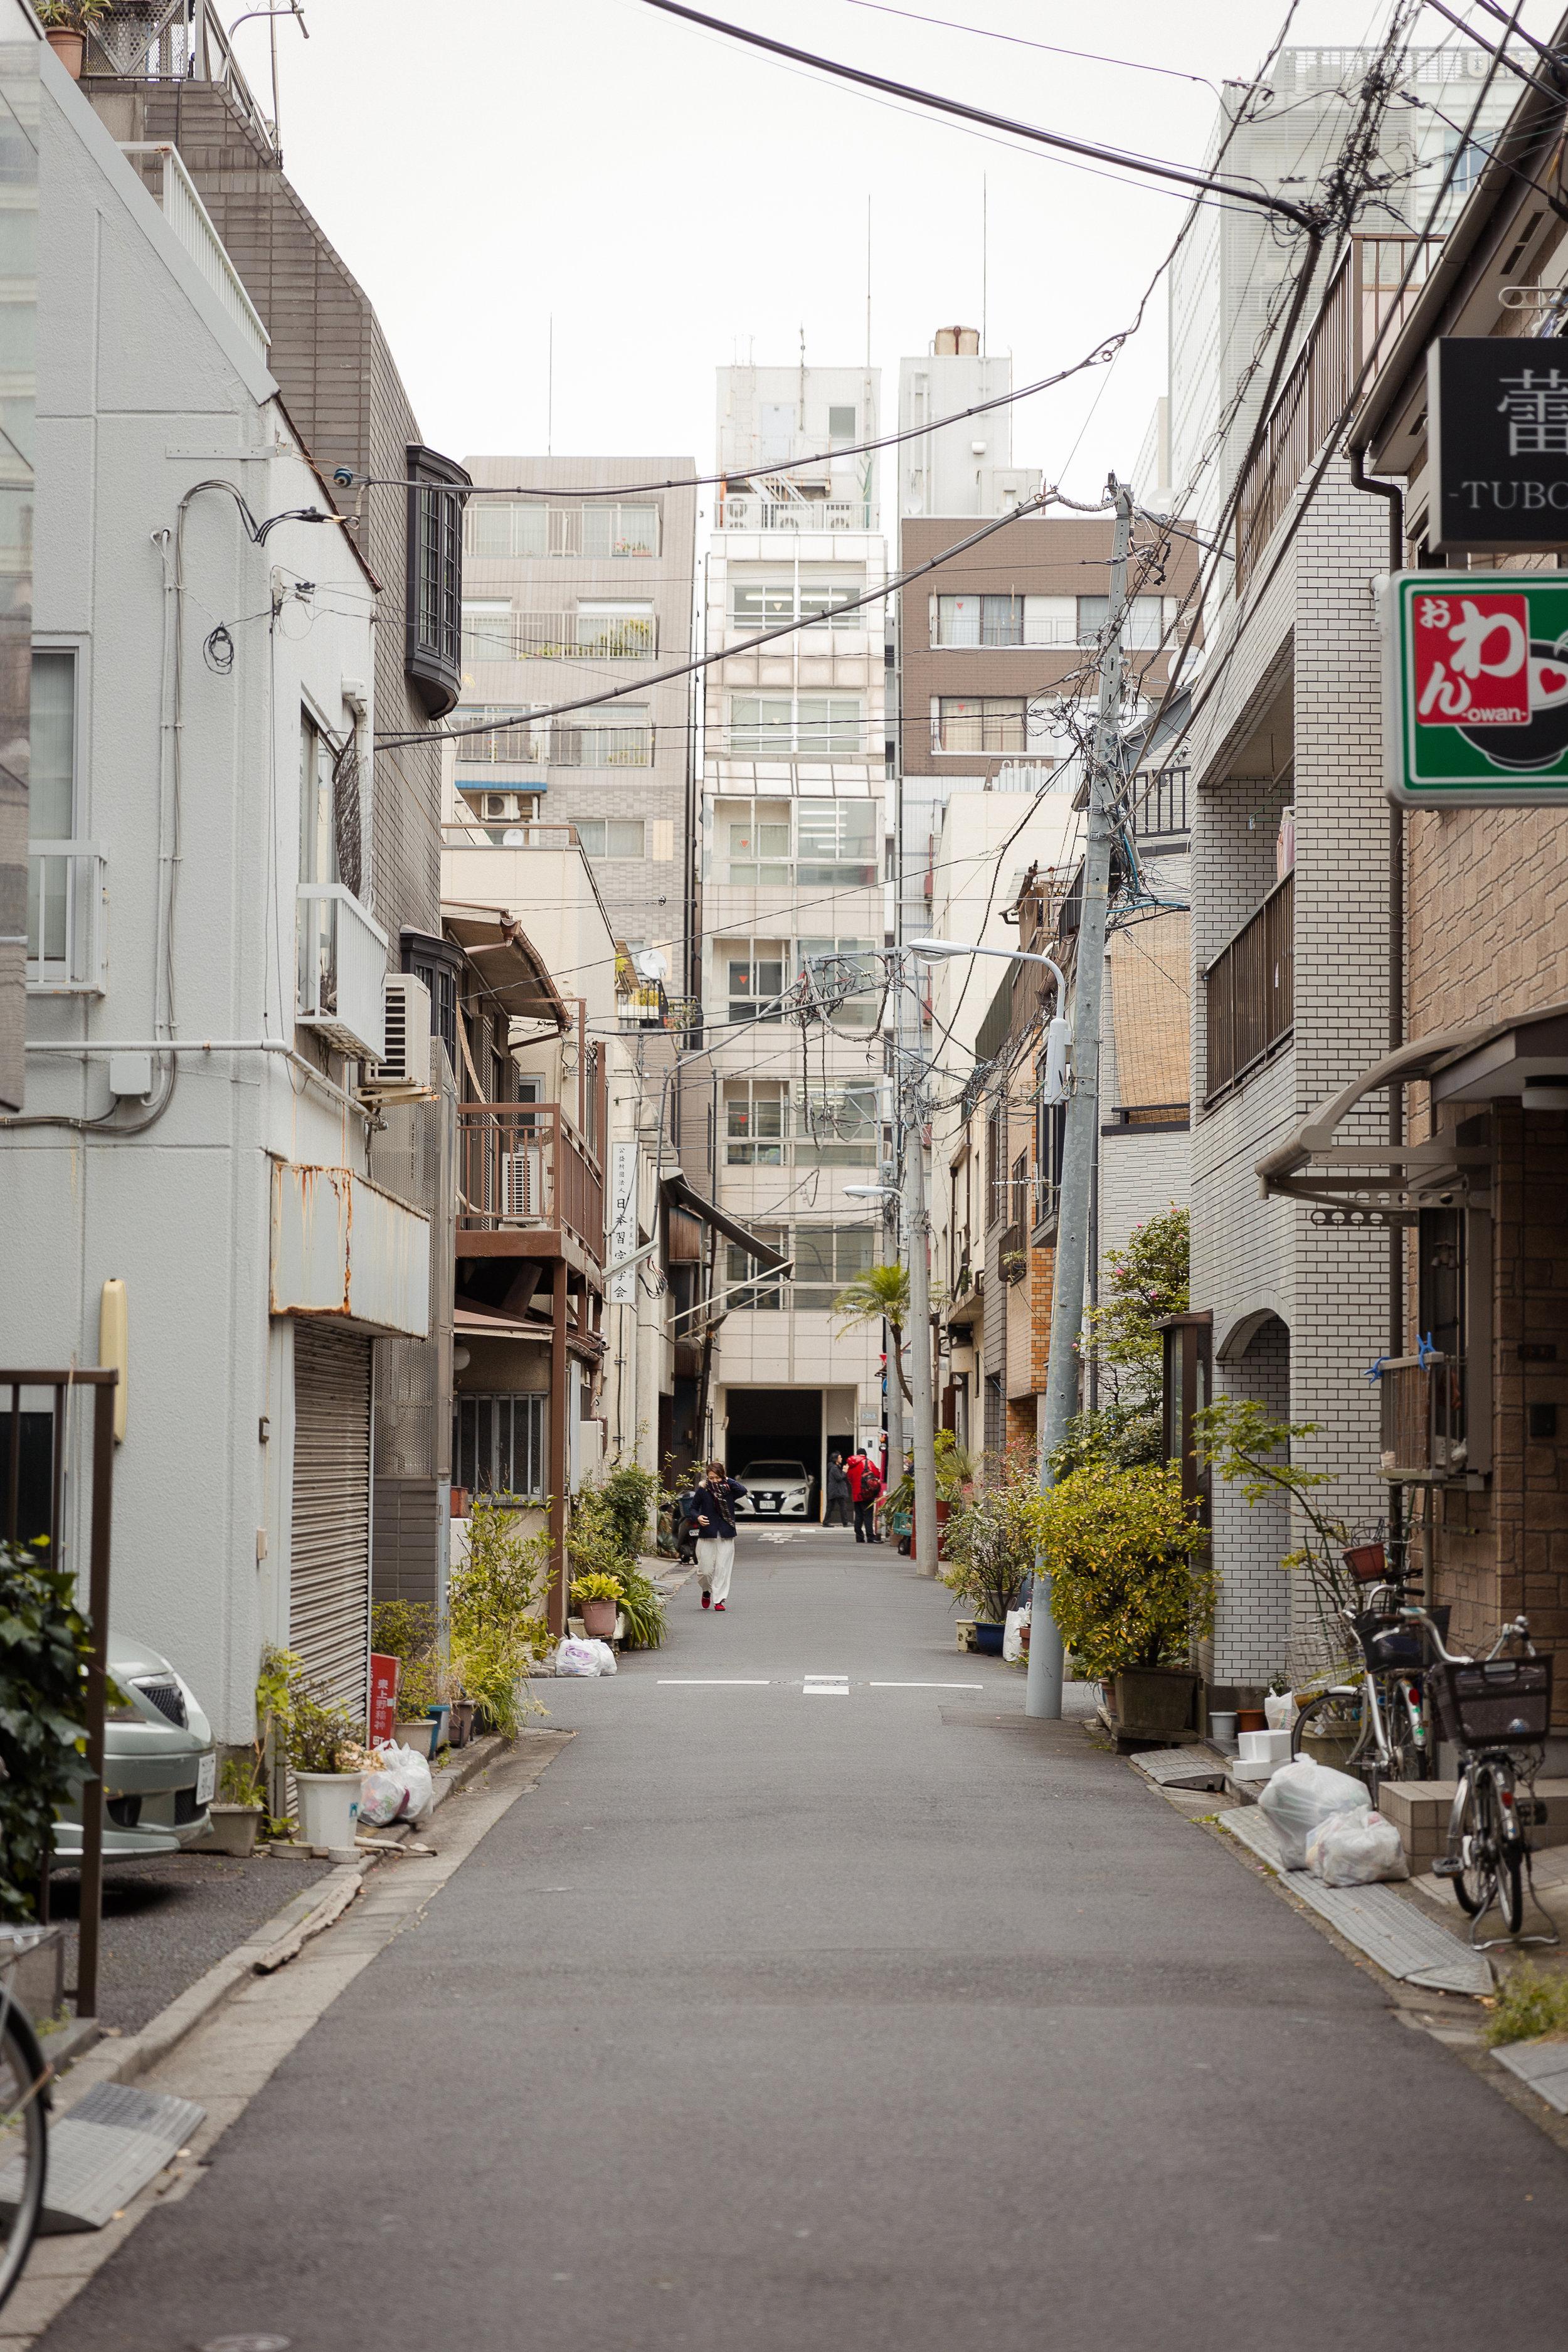 Streets in Asakusa, Tokyo Japan